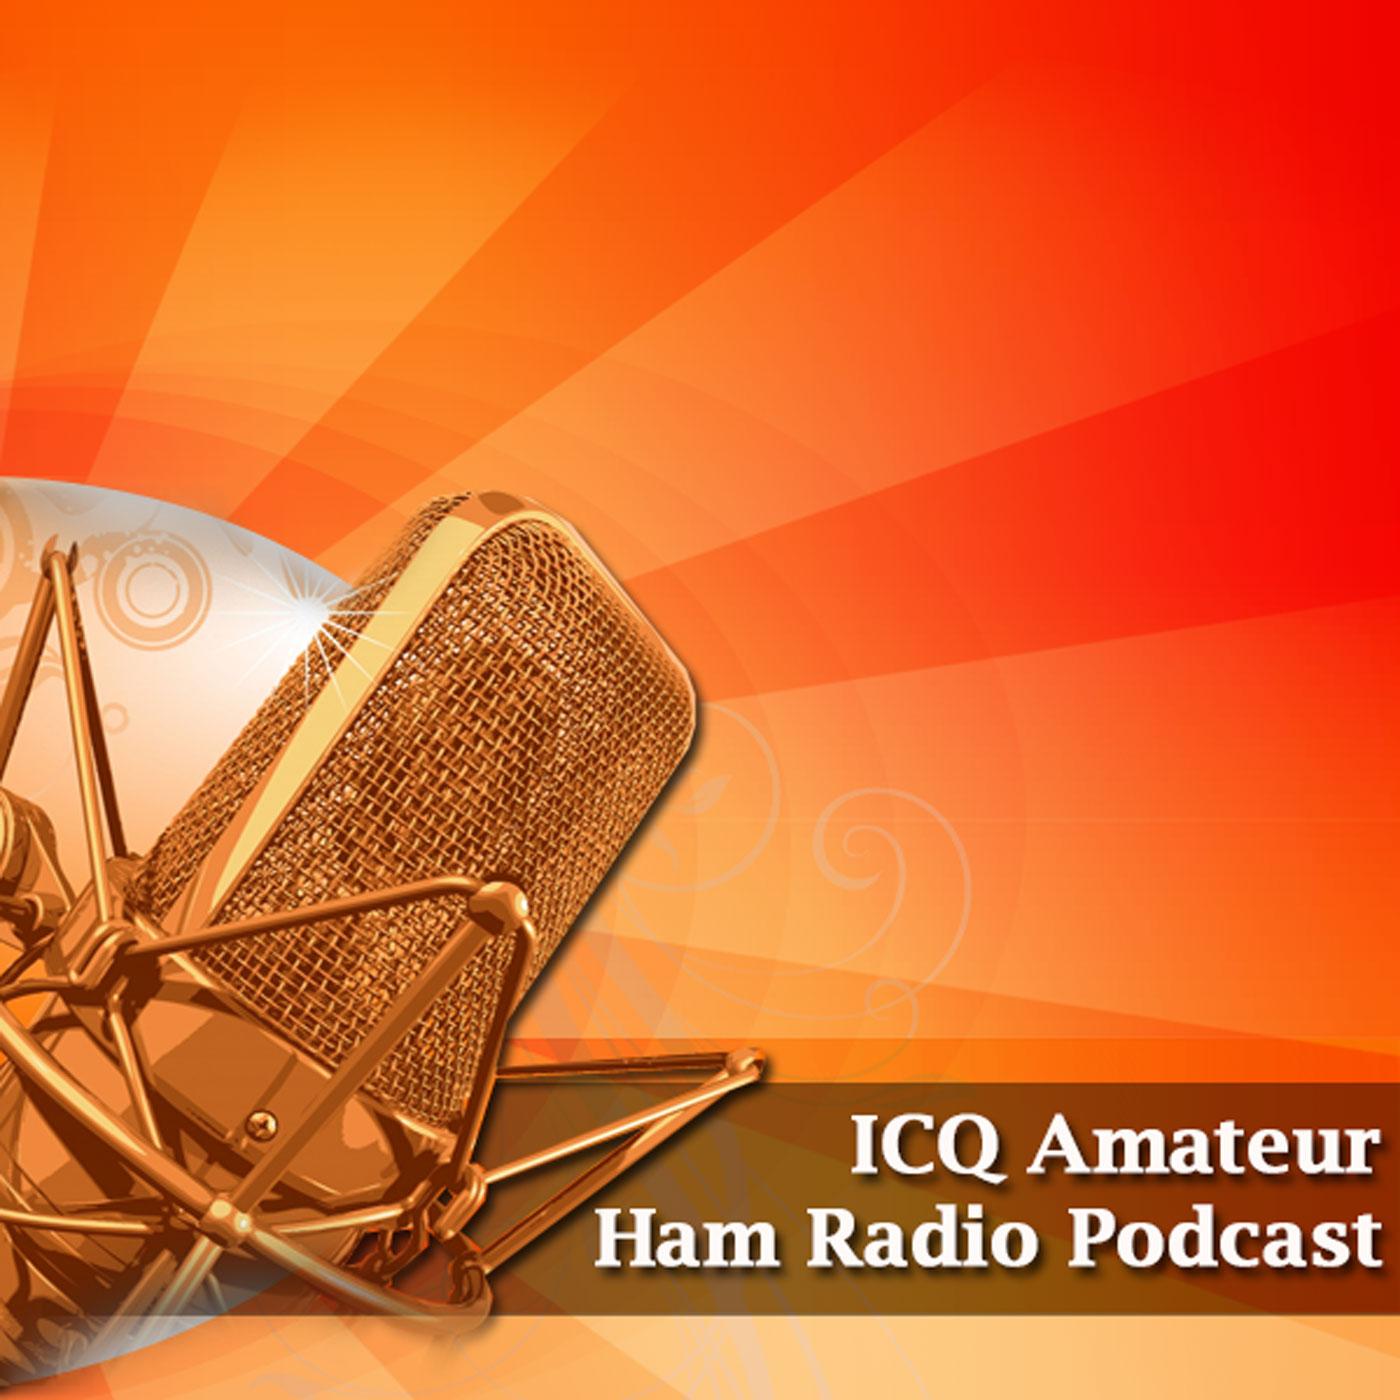 ICQ Podcast Episode 285 - Icom IC-9700 - First Impression.jpg